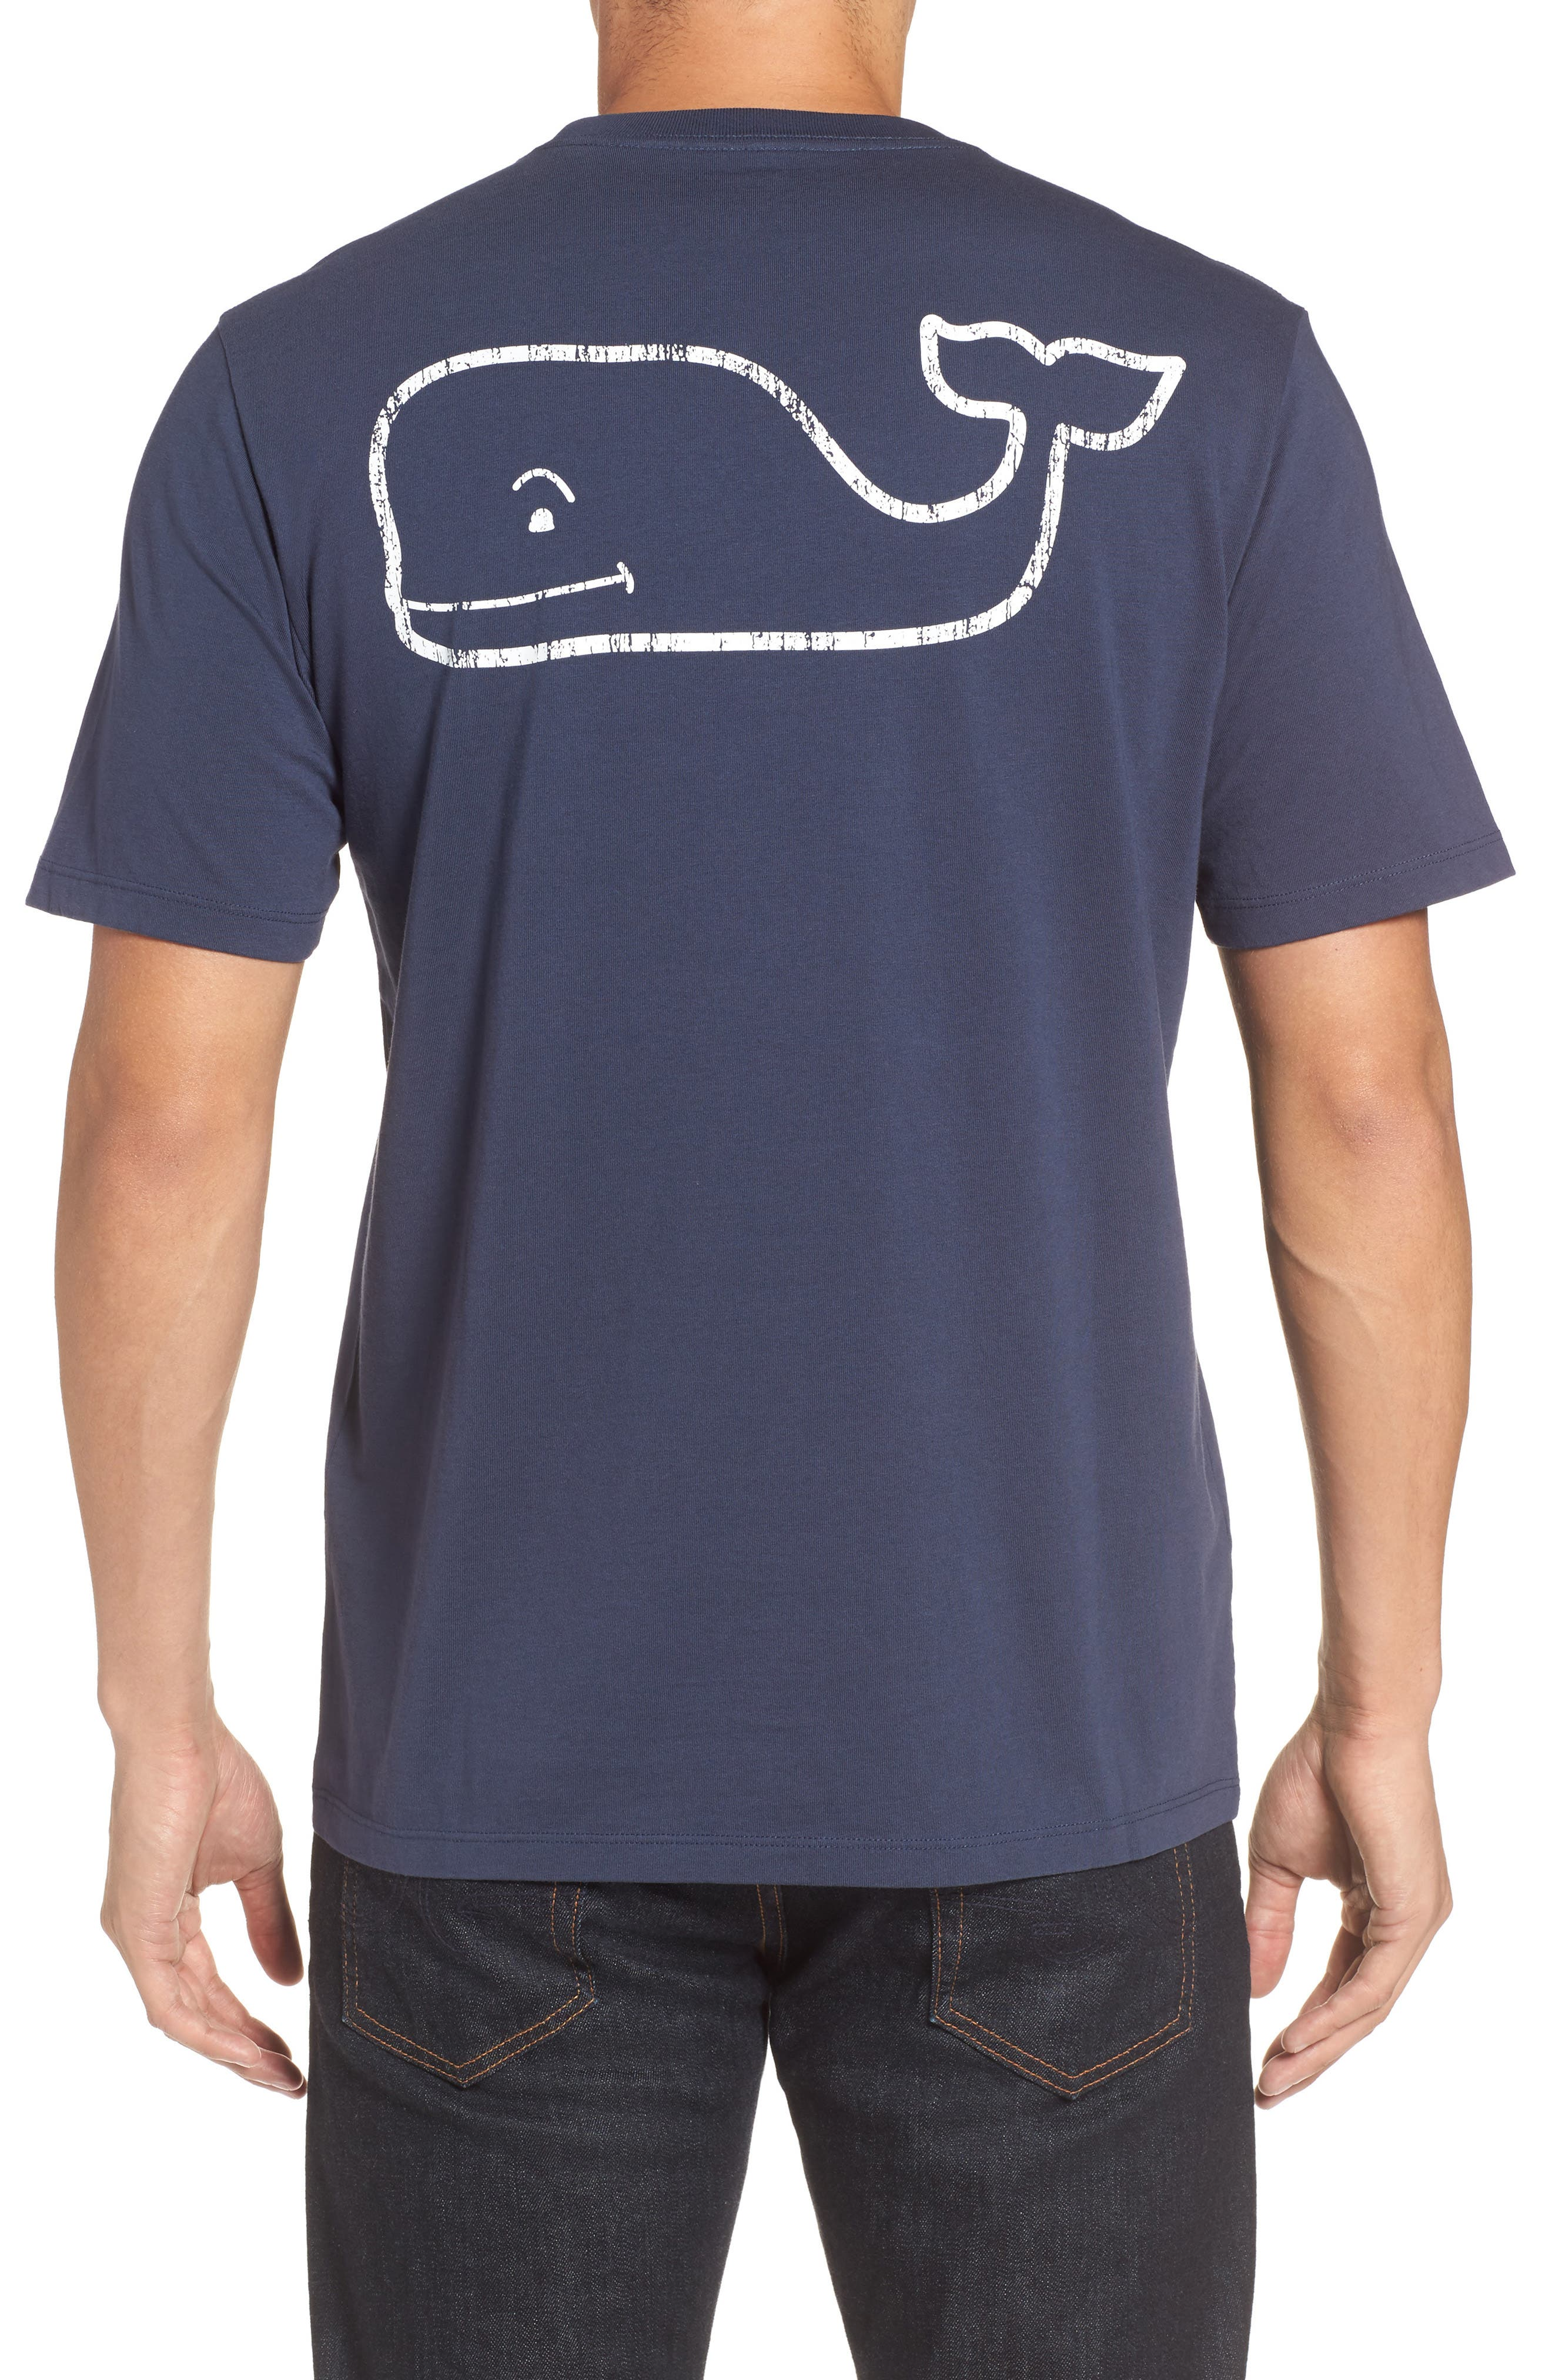 Main Image - vineyard vines Vintage Whale Pocket T-Shirt